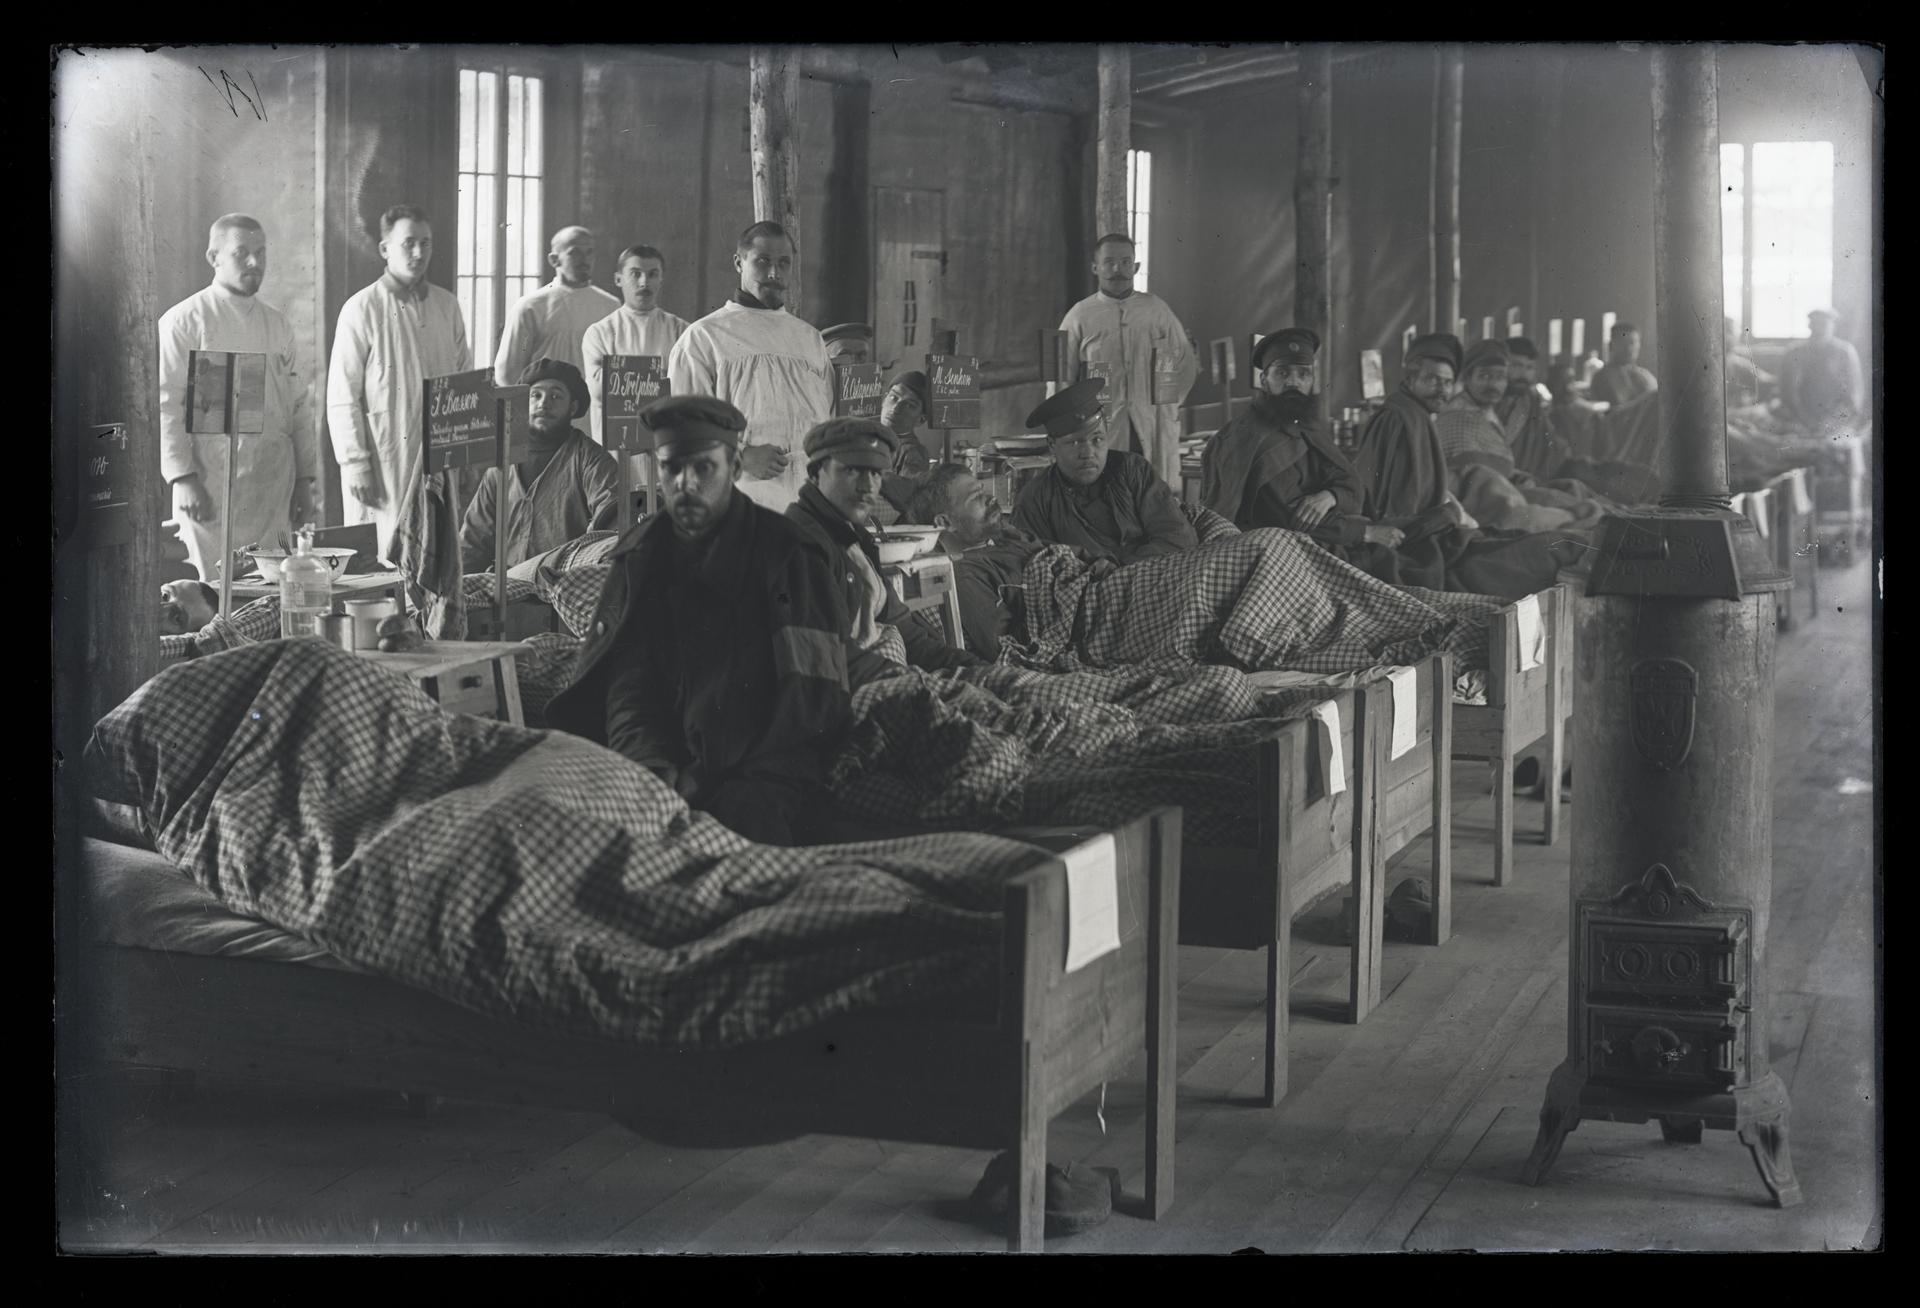 Kriegsgefangenenlager_image_0411.jpg